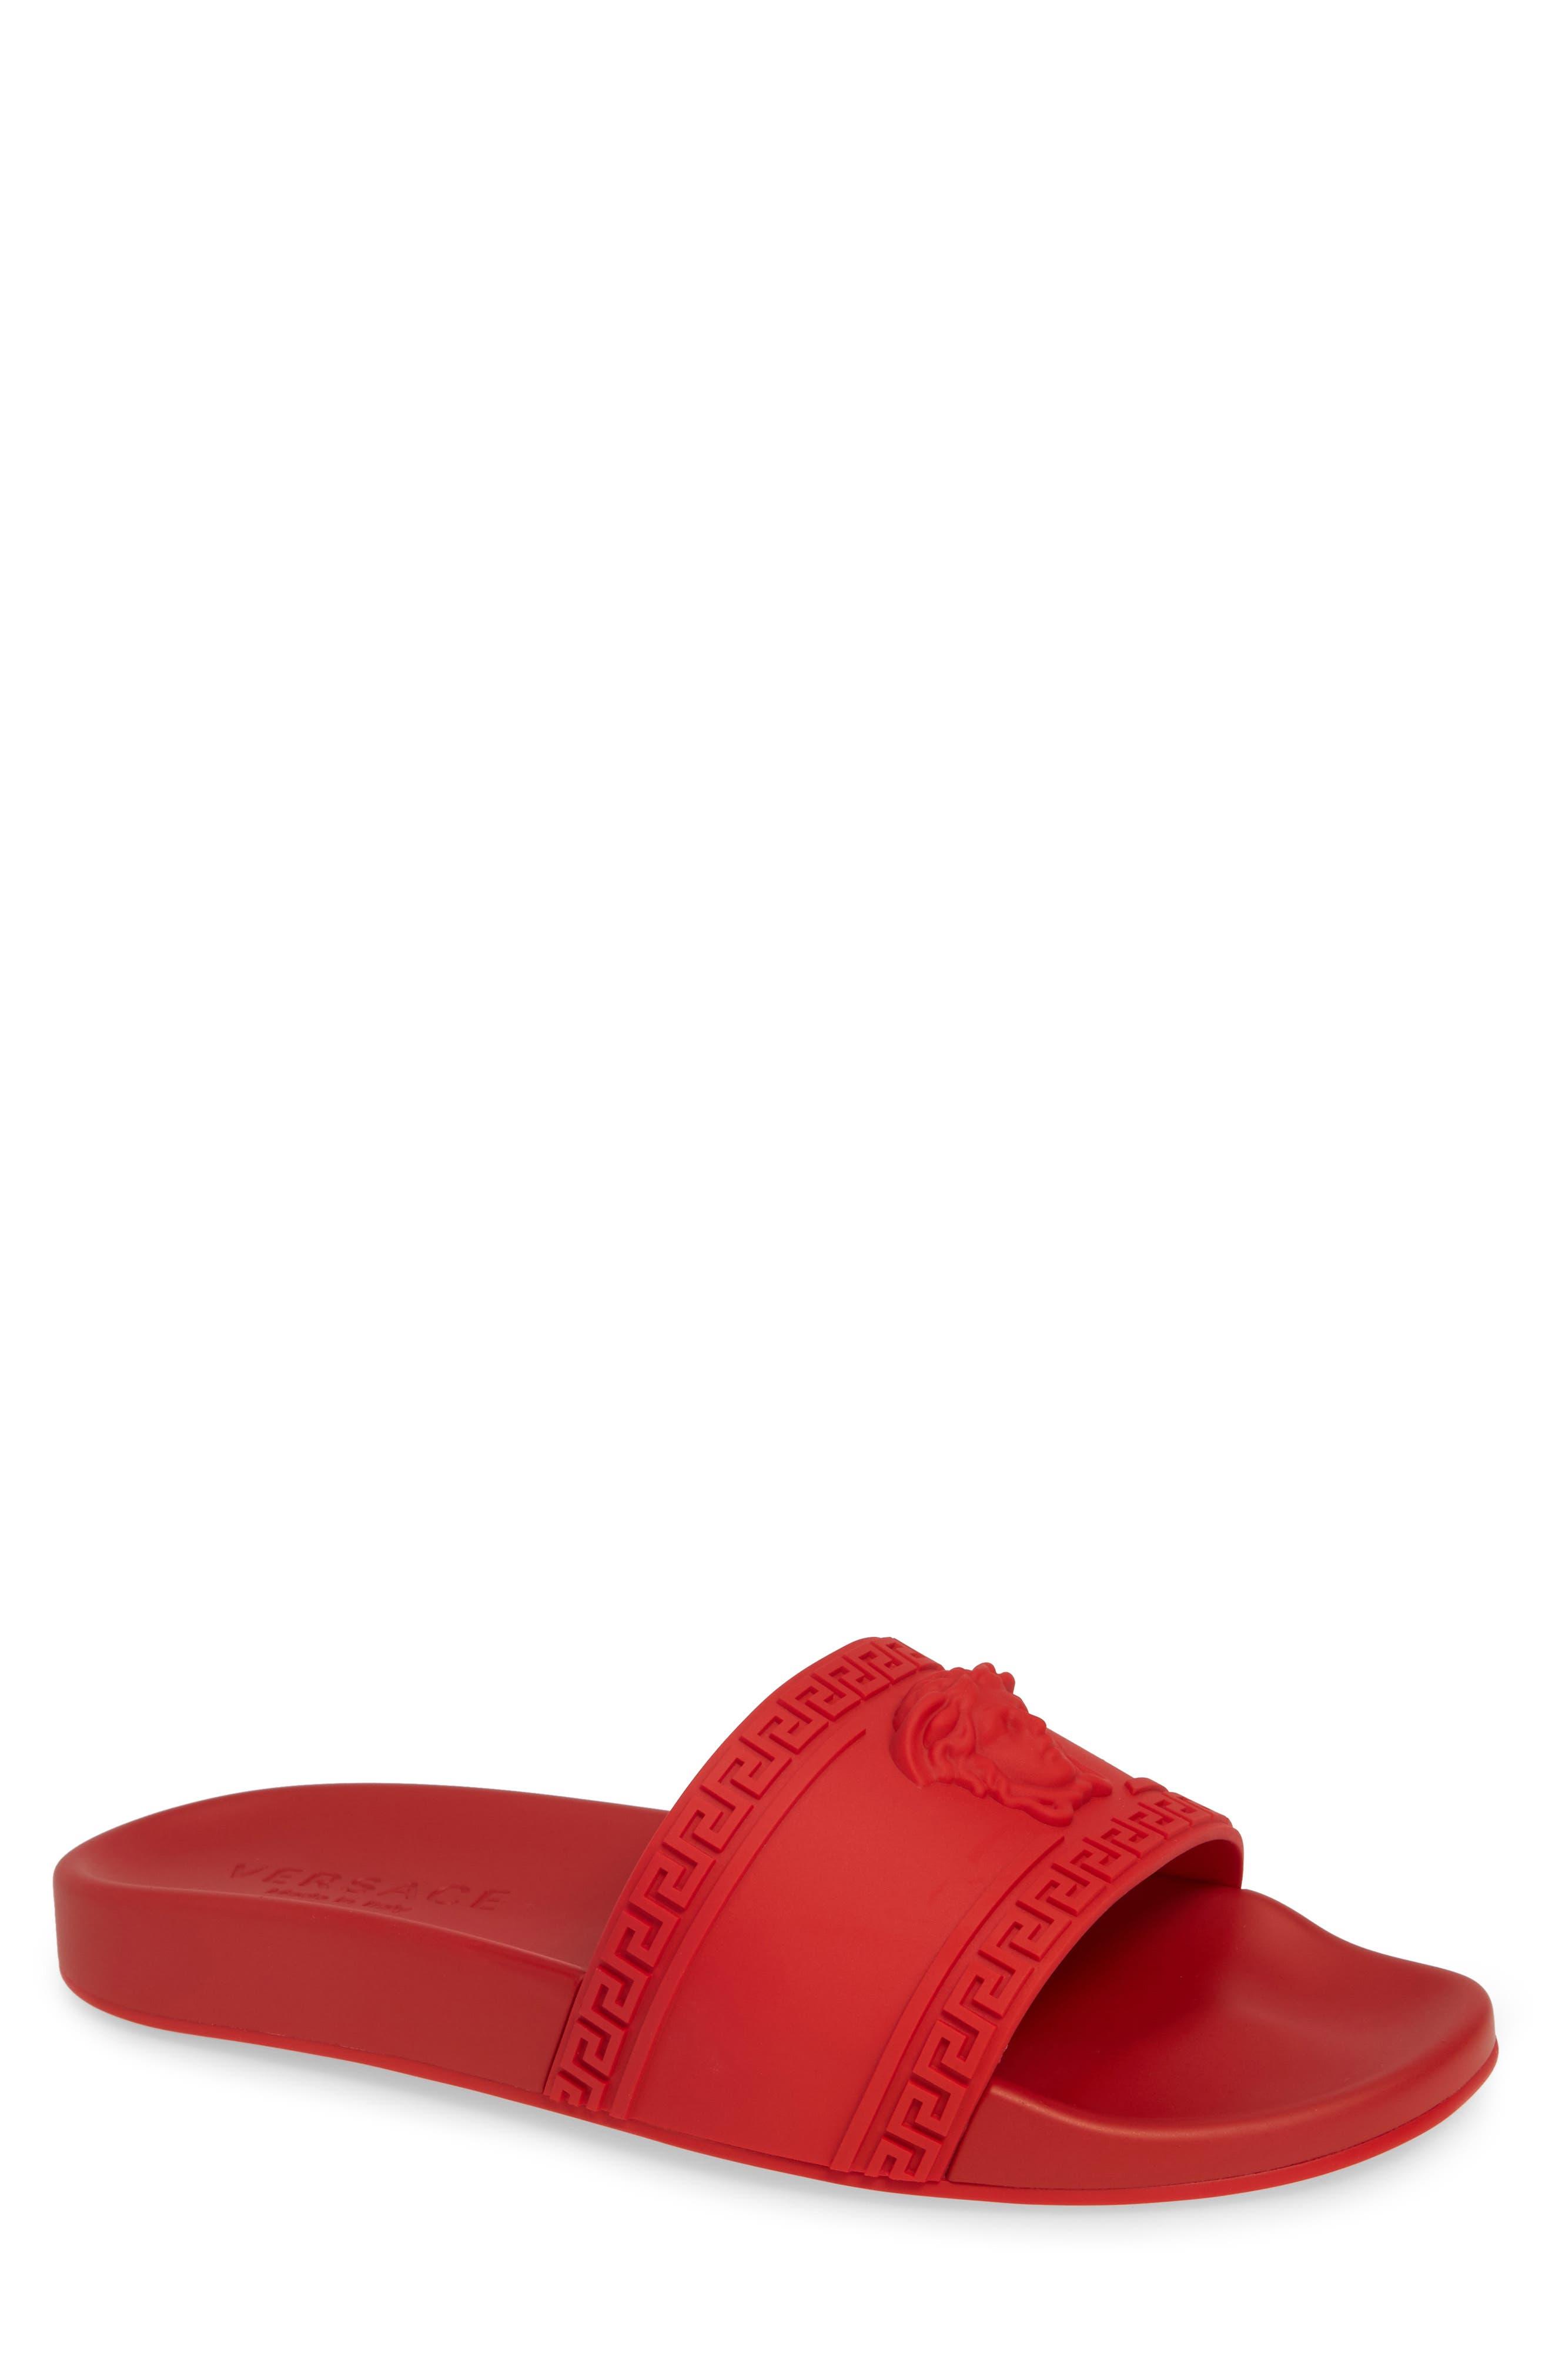 VERSACE, Palazzo Medusa Slide Sandal, Main thumbnail 1, color, RED